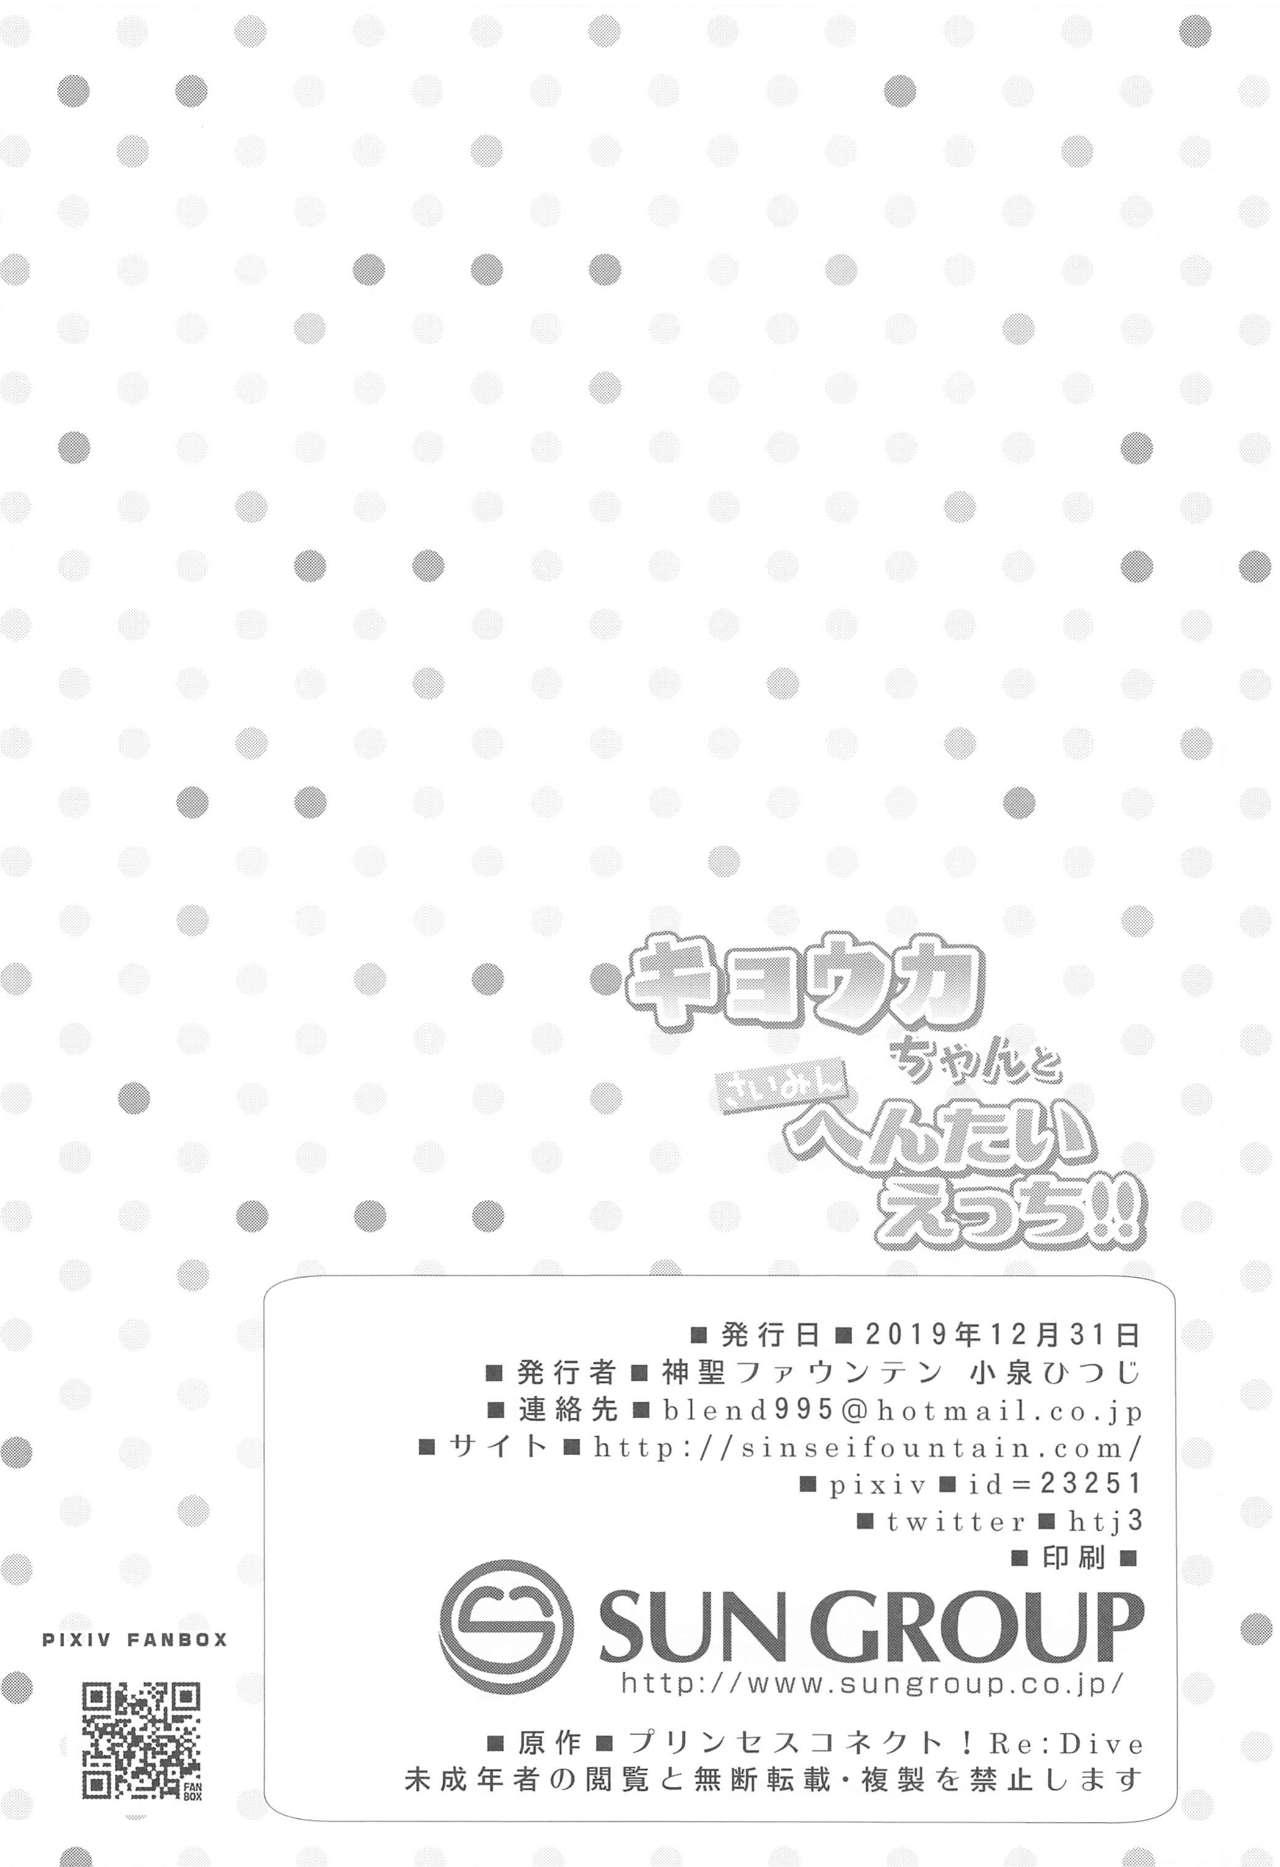 Kyouka-chan to Saimin Hentai Ecchi!! 25